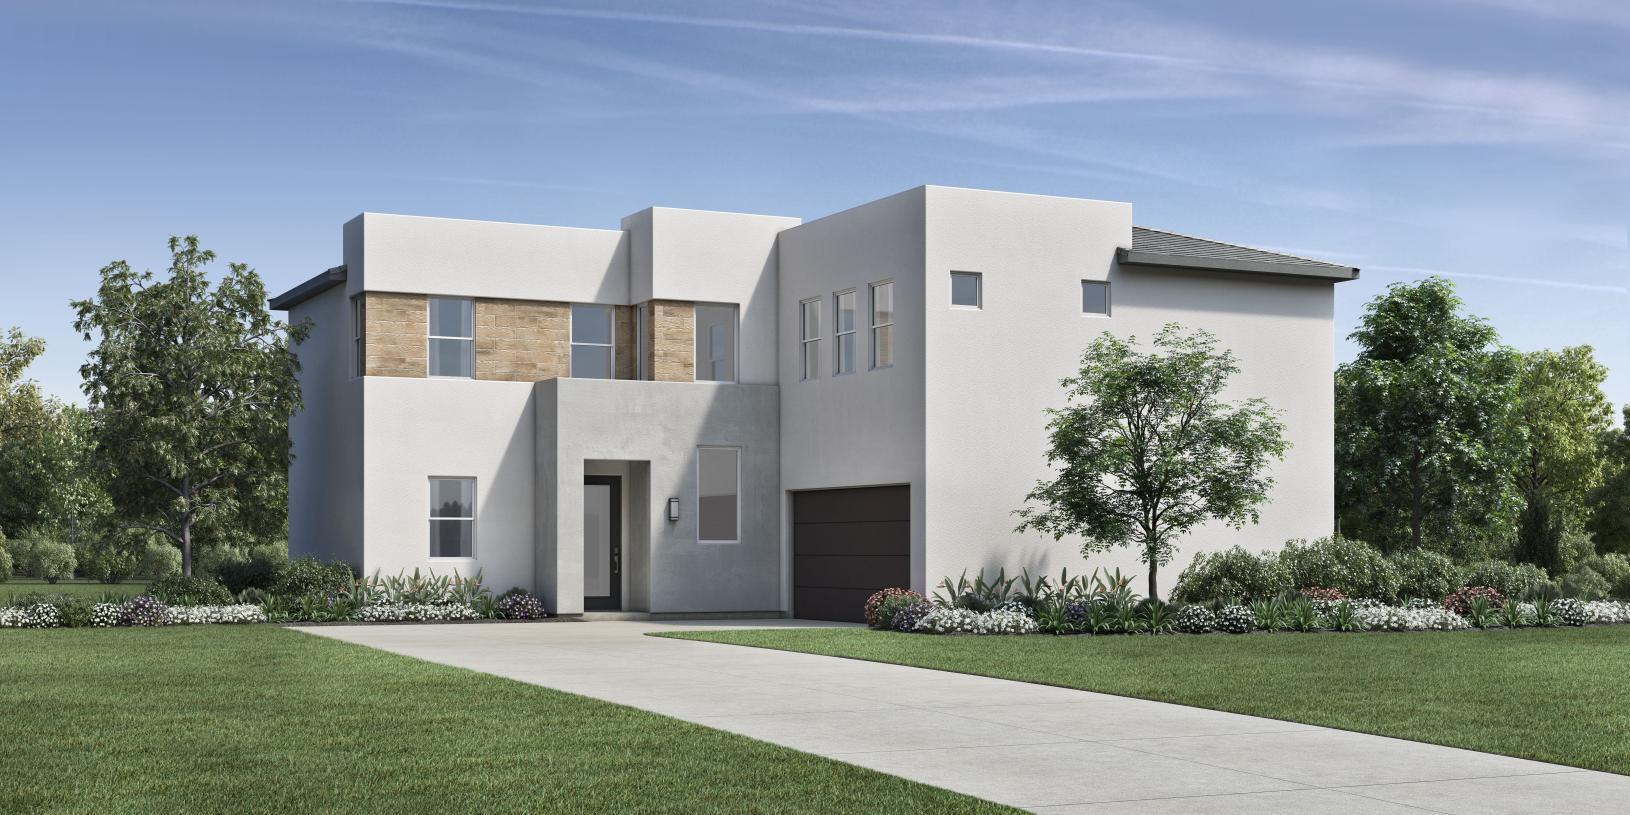 Elevation Image:California Modern